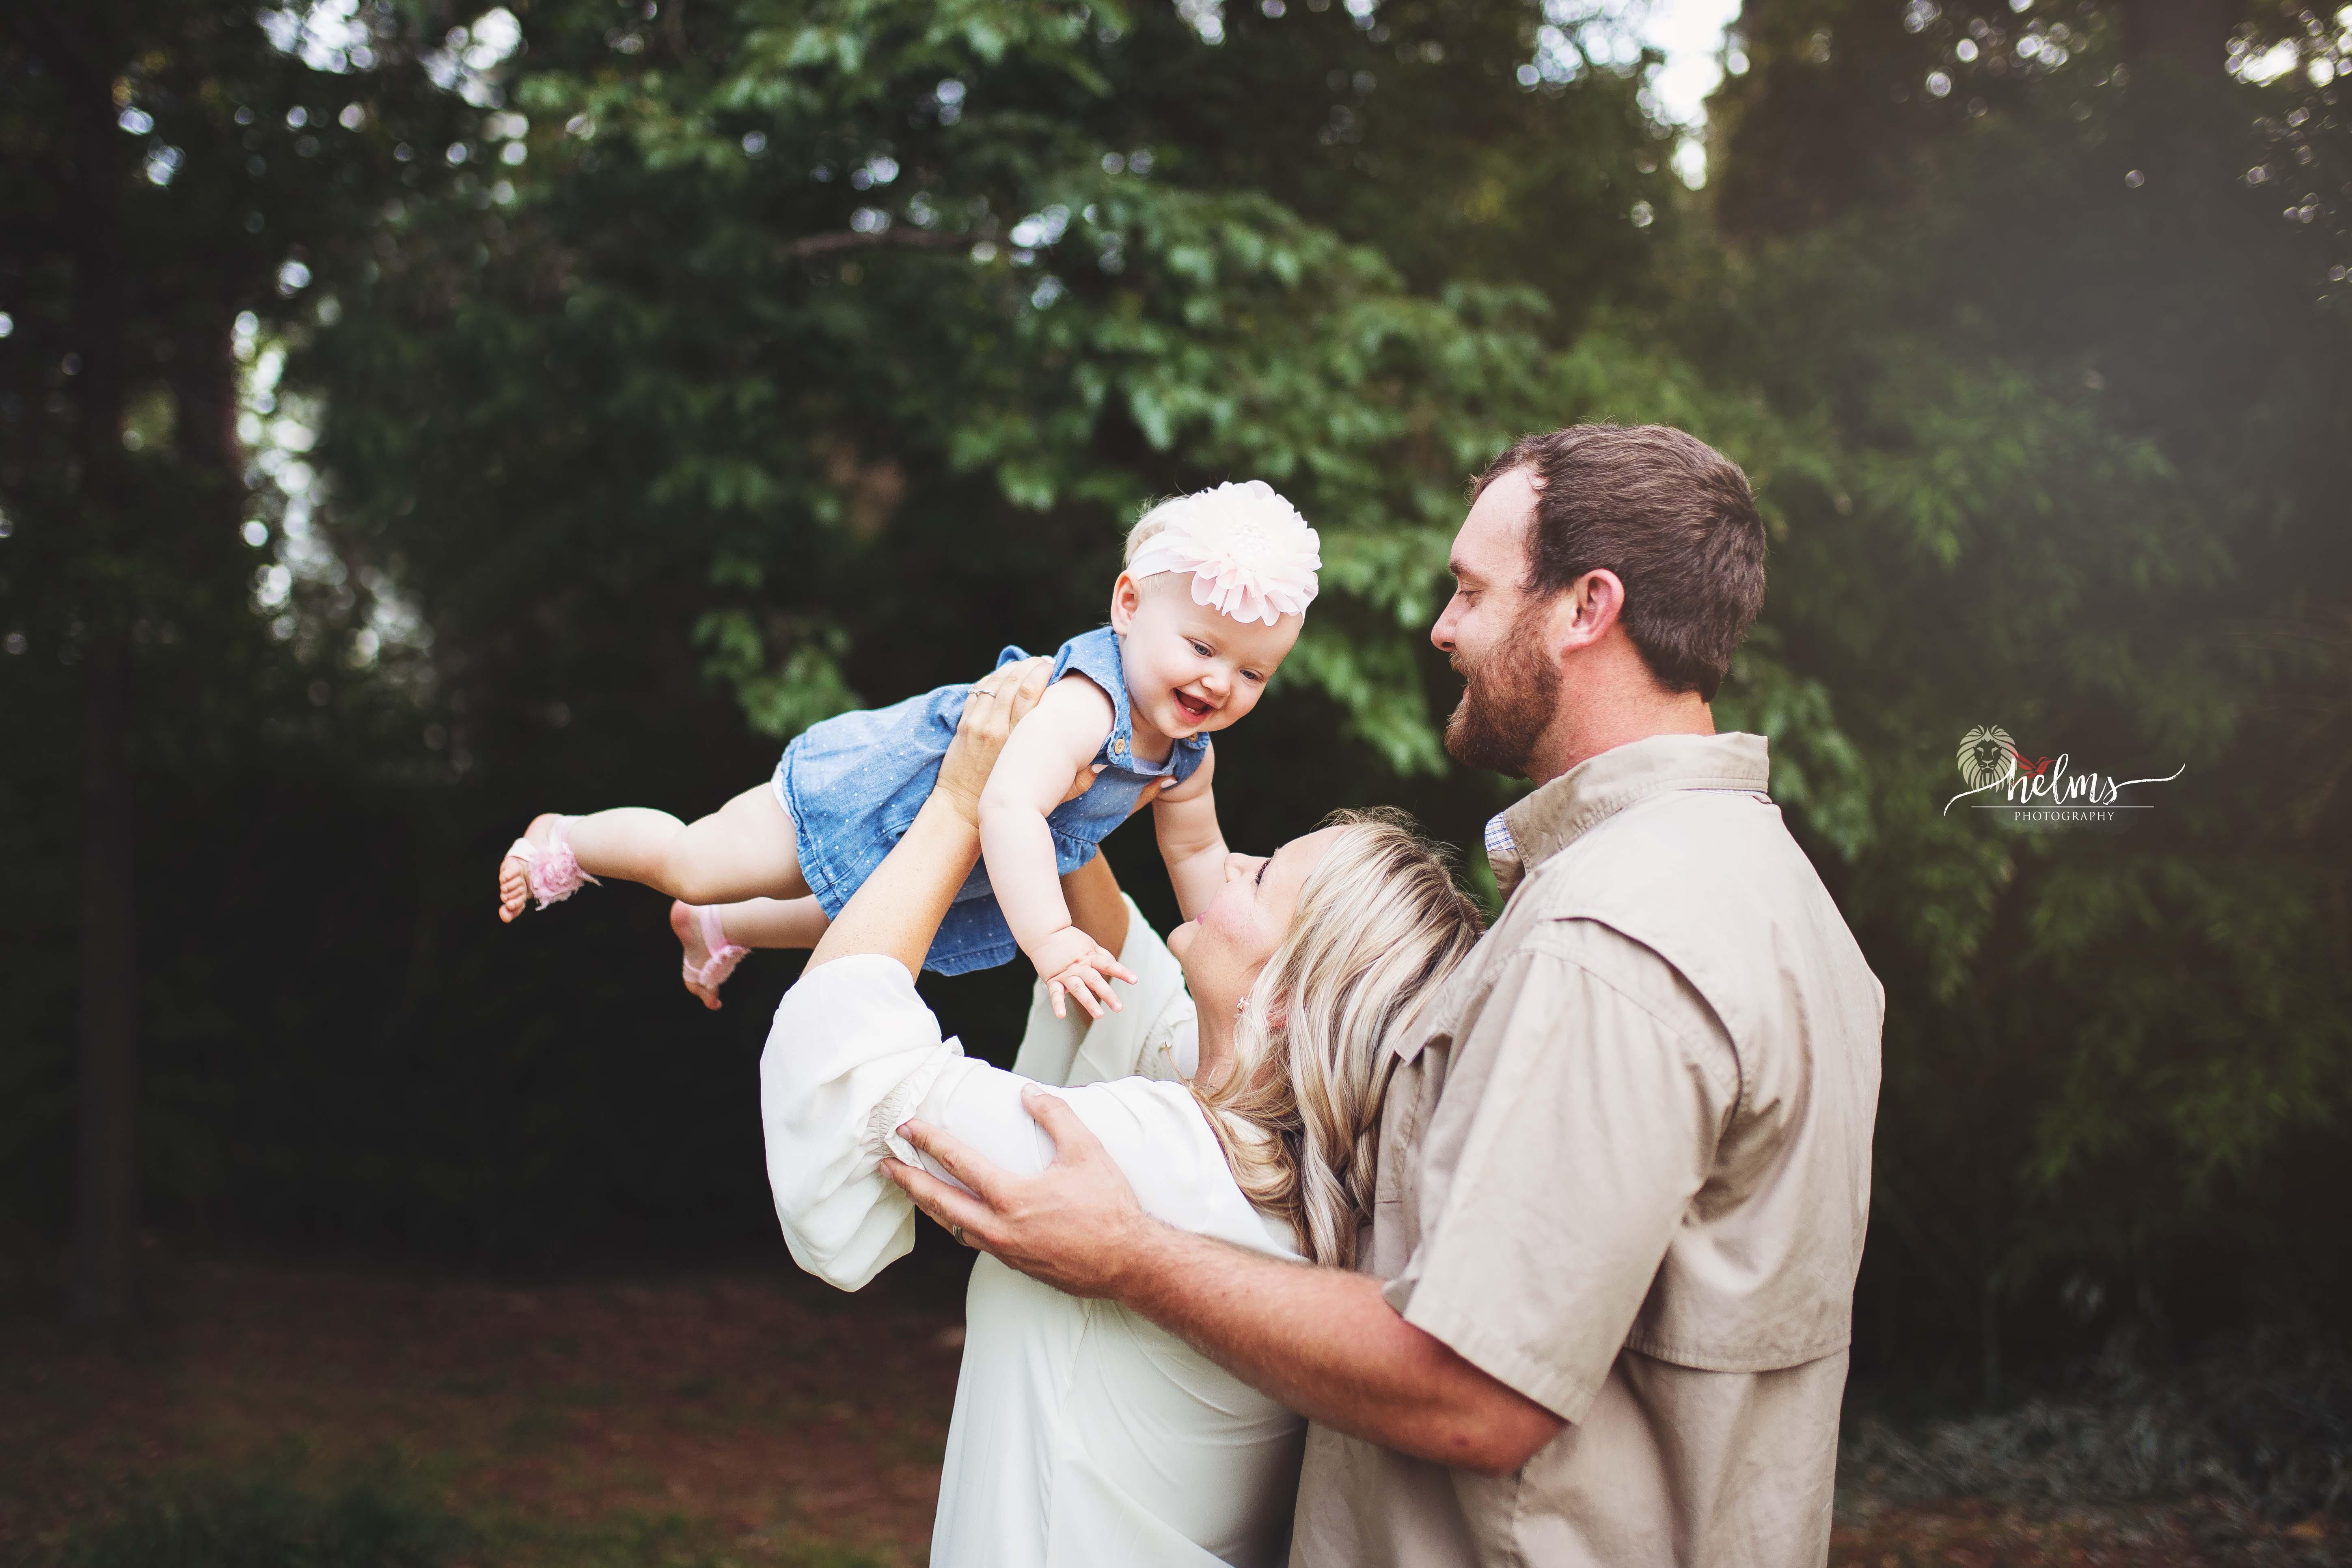 Outdoor Family Photography Texarkana, Texas